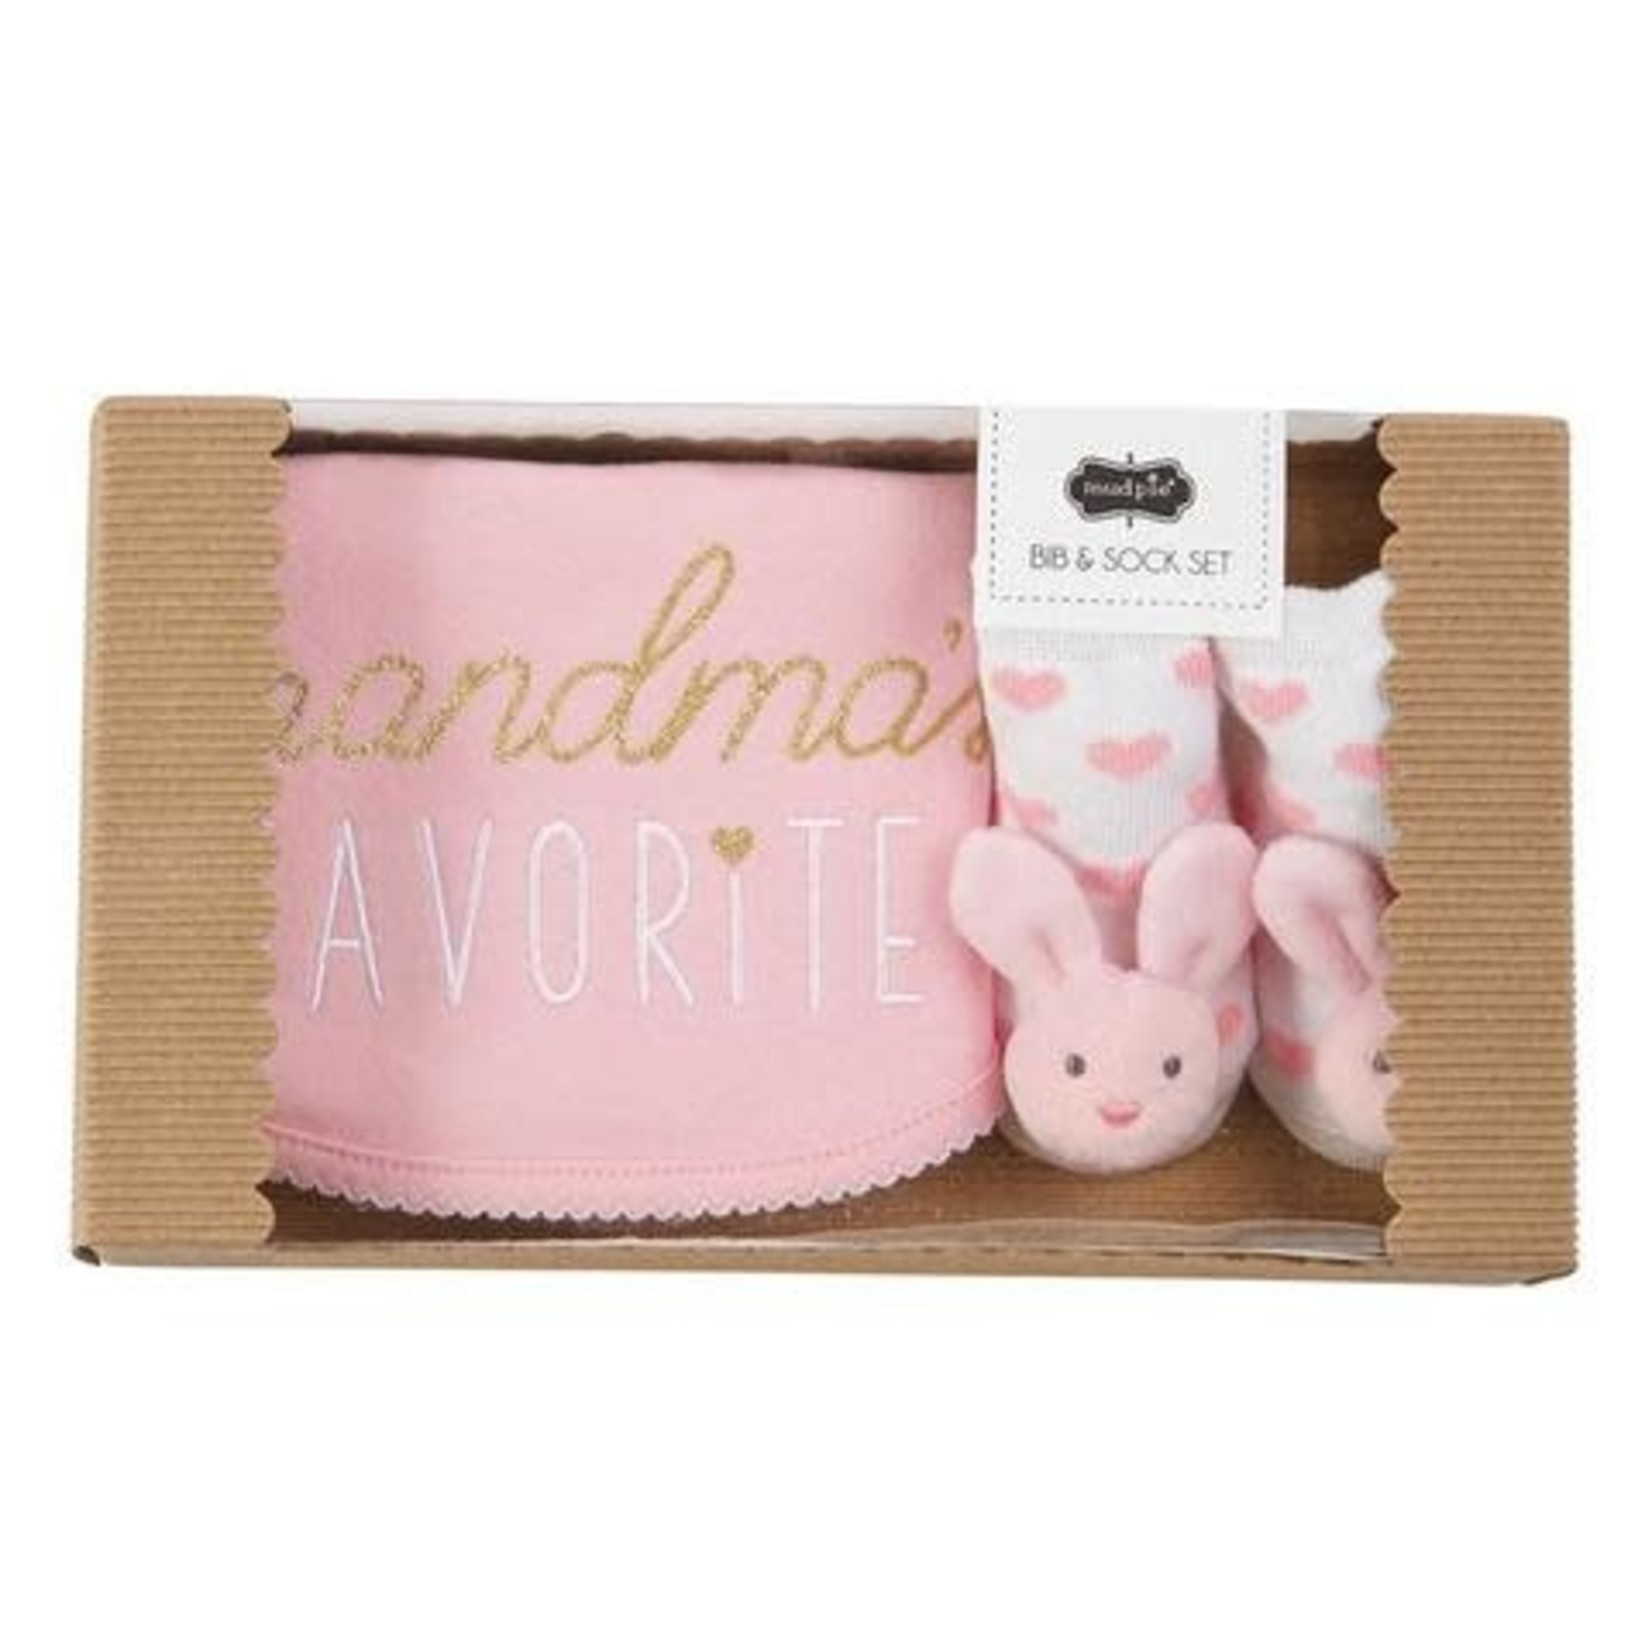 Mudpie Grandmas Favourite Bib Set, Pink